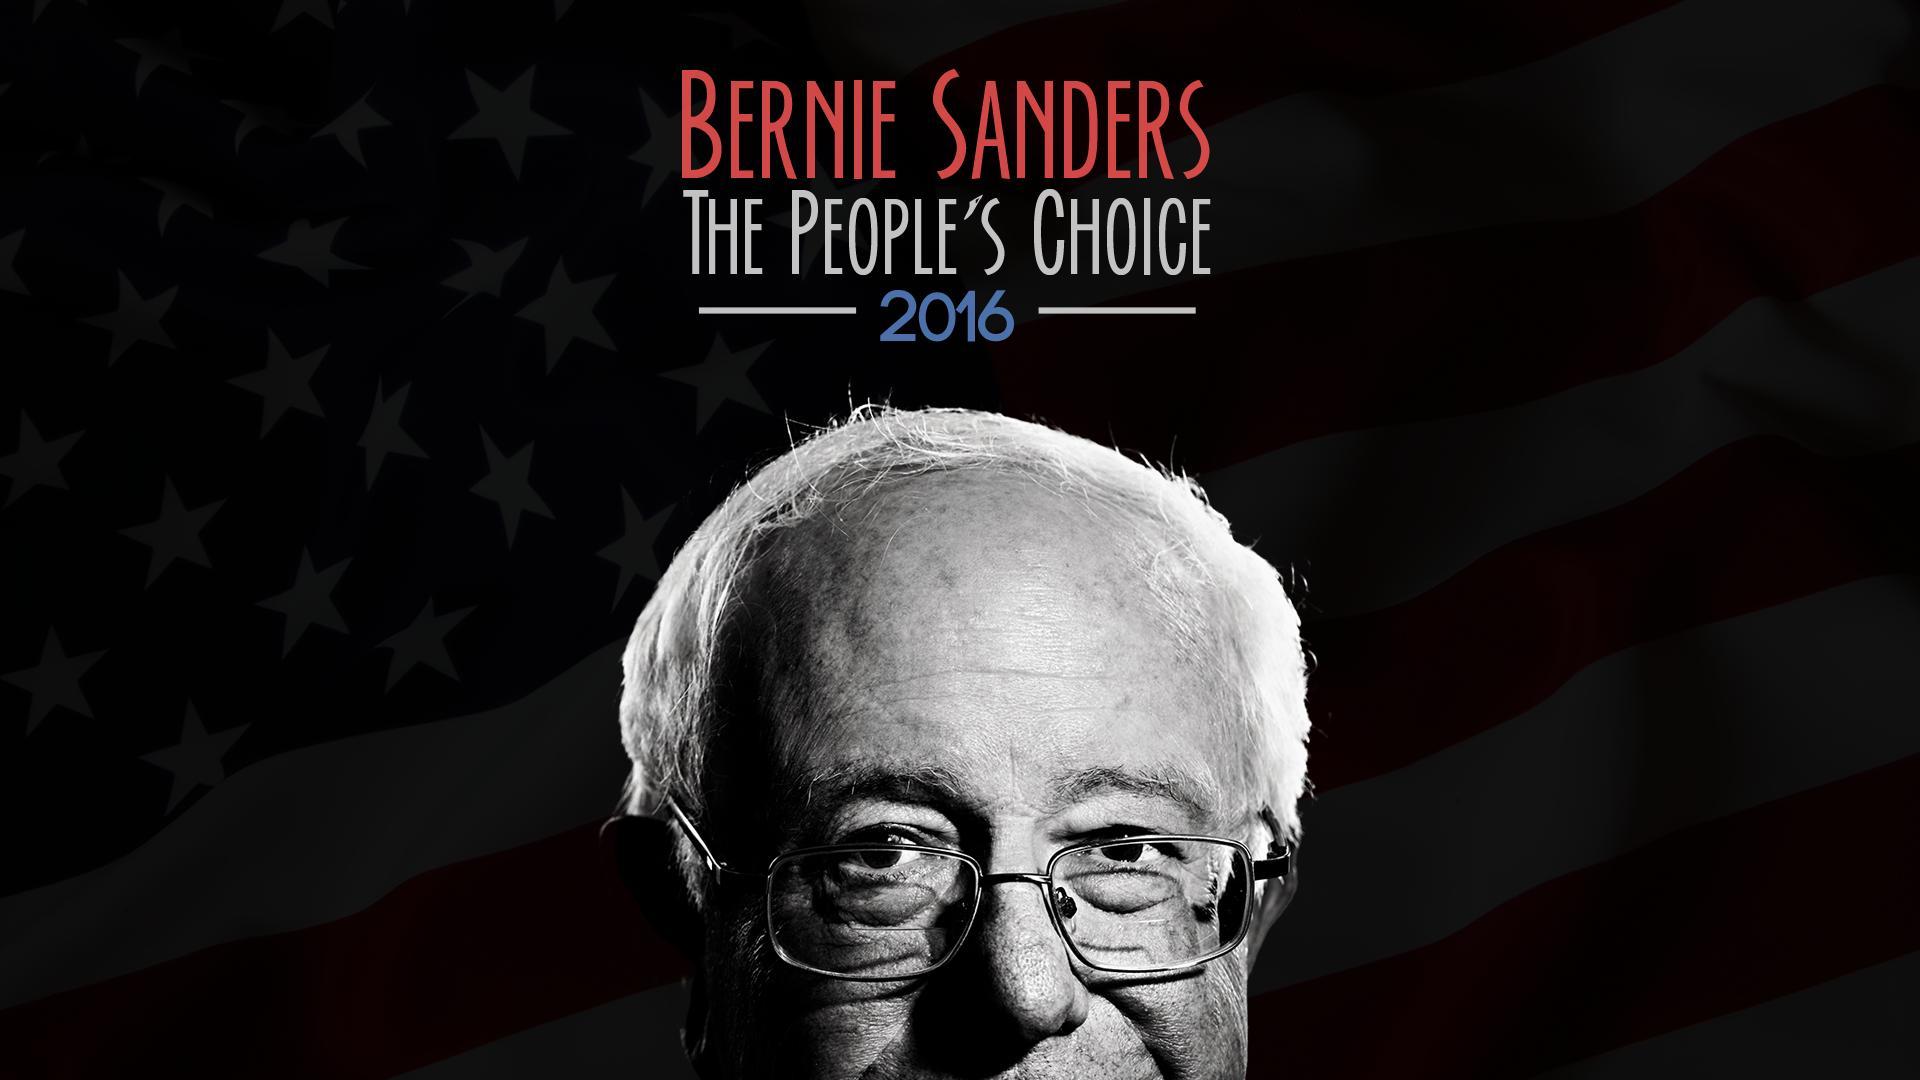 Bernie Sanders Wallpaper Download: MyConfinedSpace